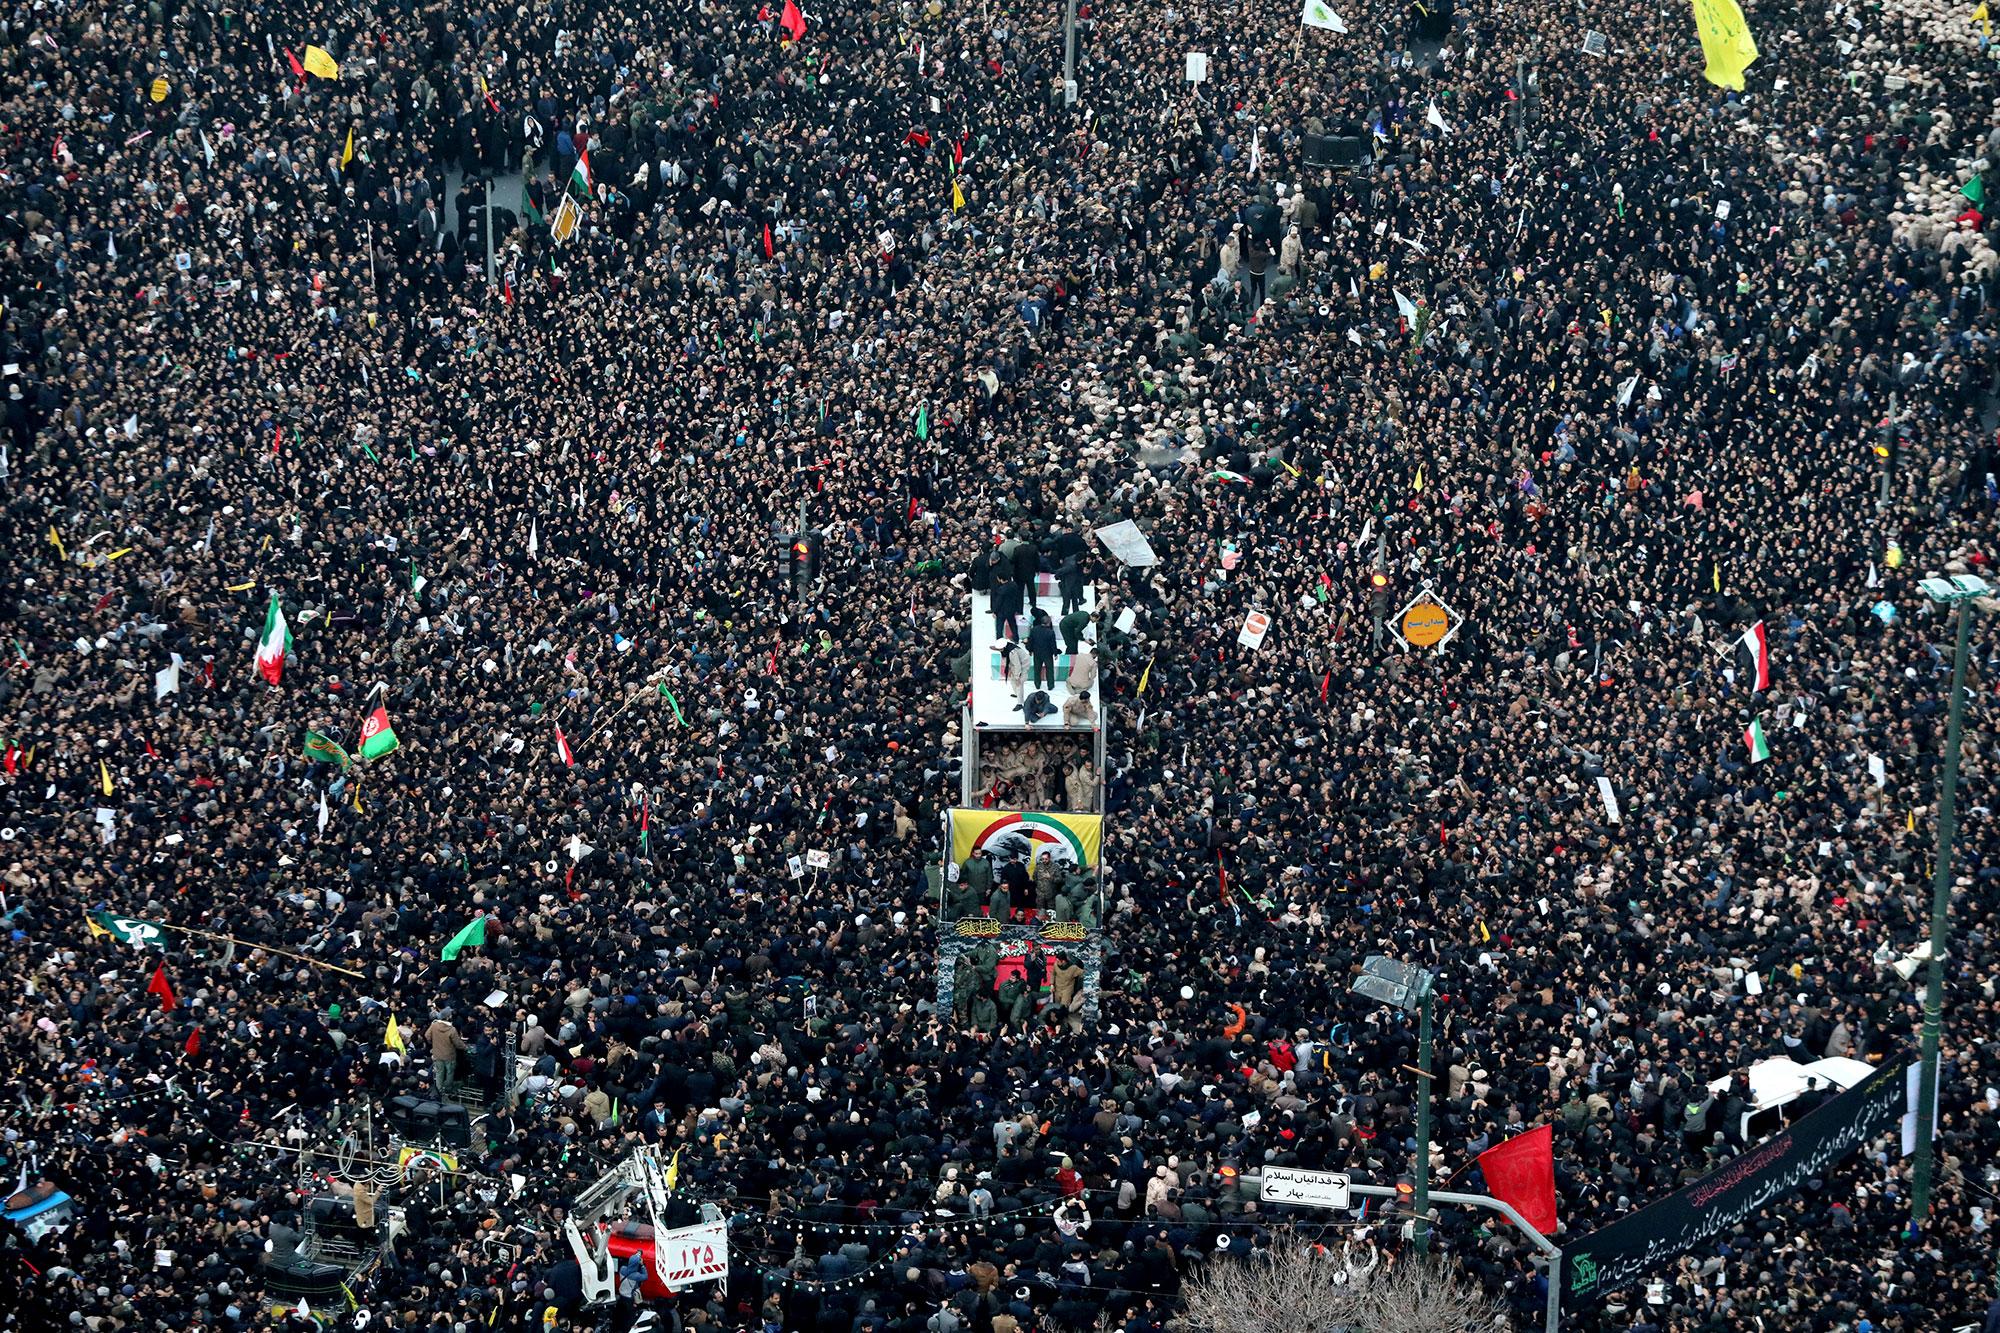 Mohammad Hossein Thaghi/Tasnim News Agency via AP